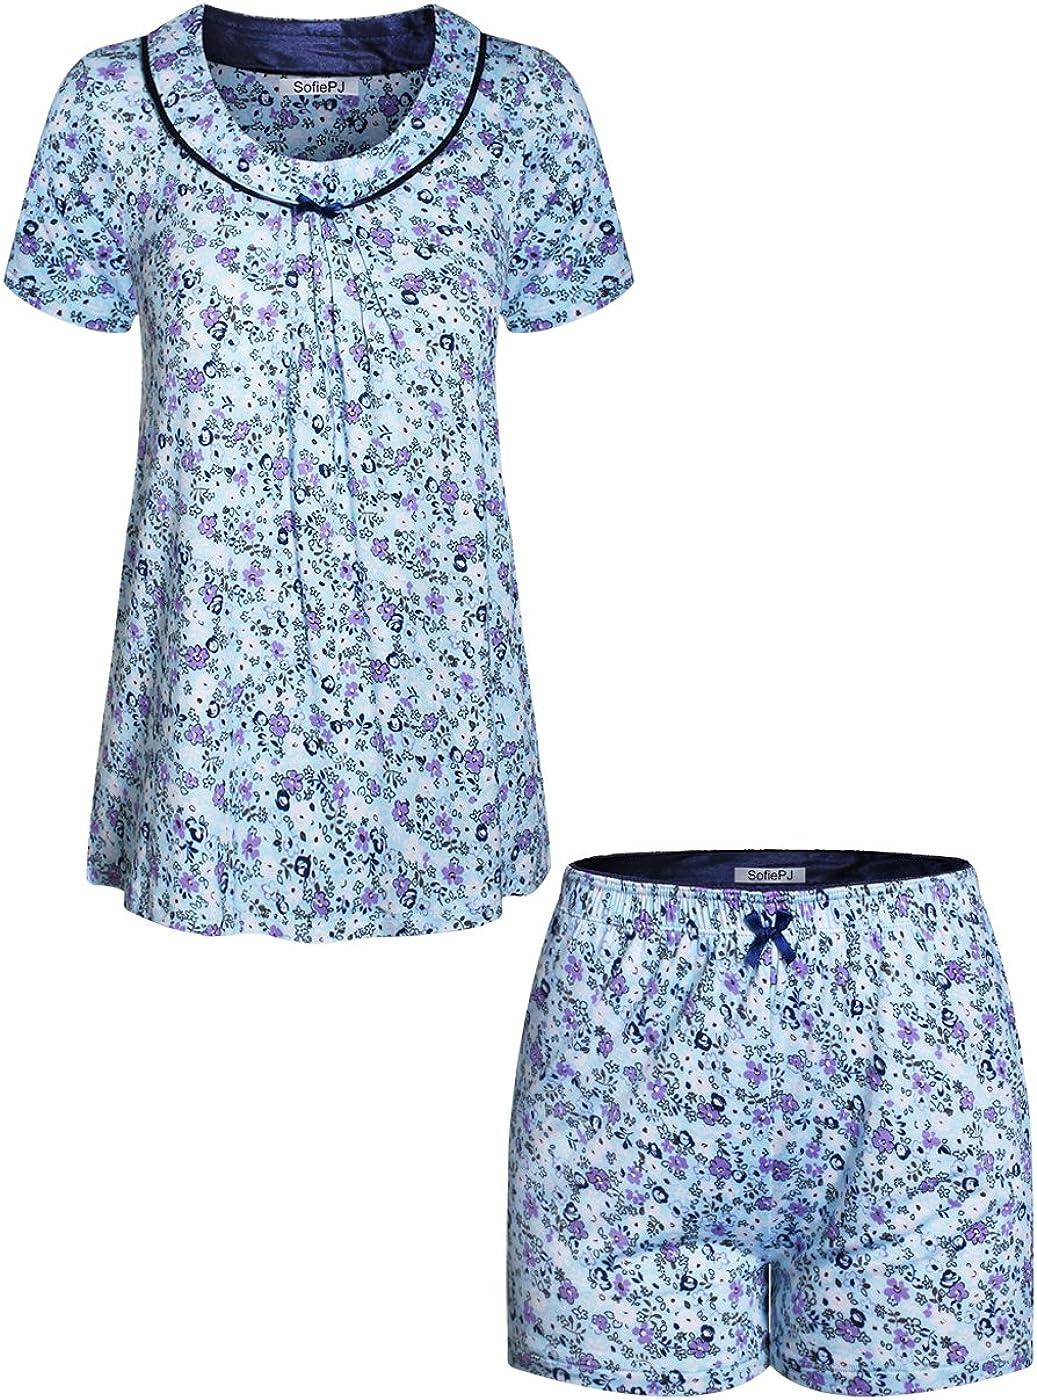 SofiePJ Women's Max 67% OFF Rayon Spandex Printed Short Neck Scoop Direct stock discount Sleepwear